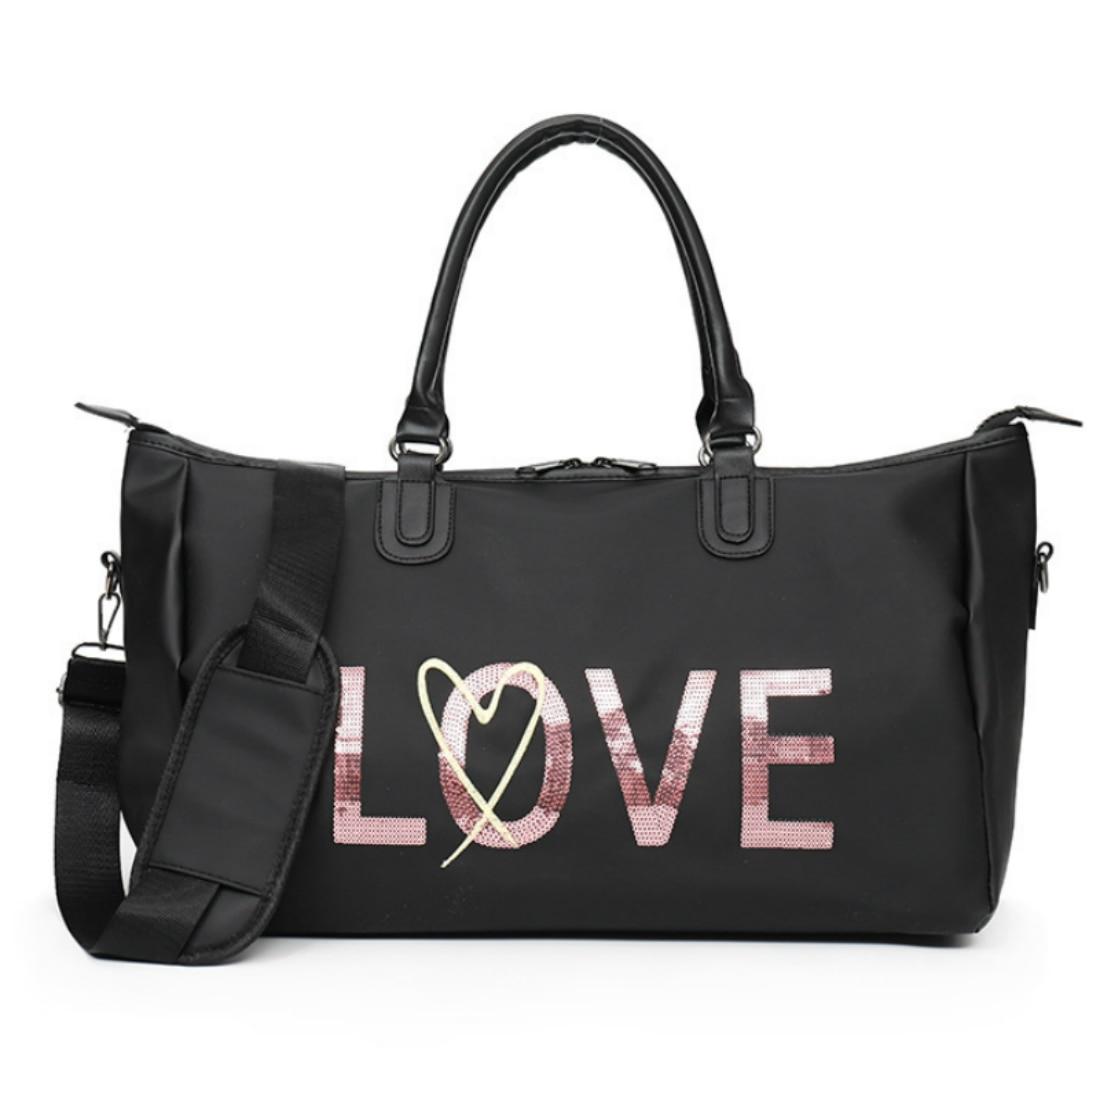 ... Sac De Sports Tote For Male XA64WA. BLACK Gym Bag Women Fitness Sport  Bags Large Capacity Training Female Yoga Duffel Bag Waterproof Handbags 8c05f25ec838d